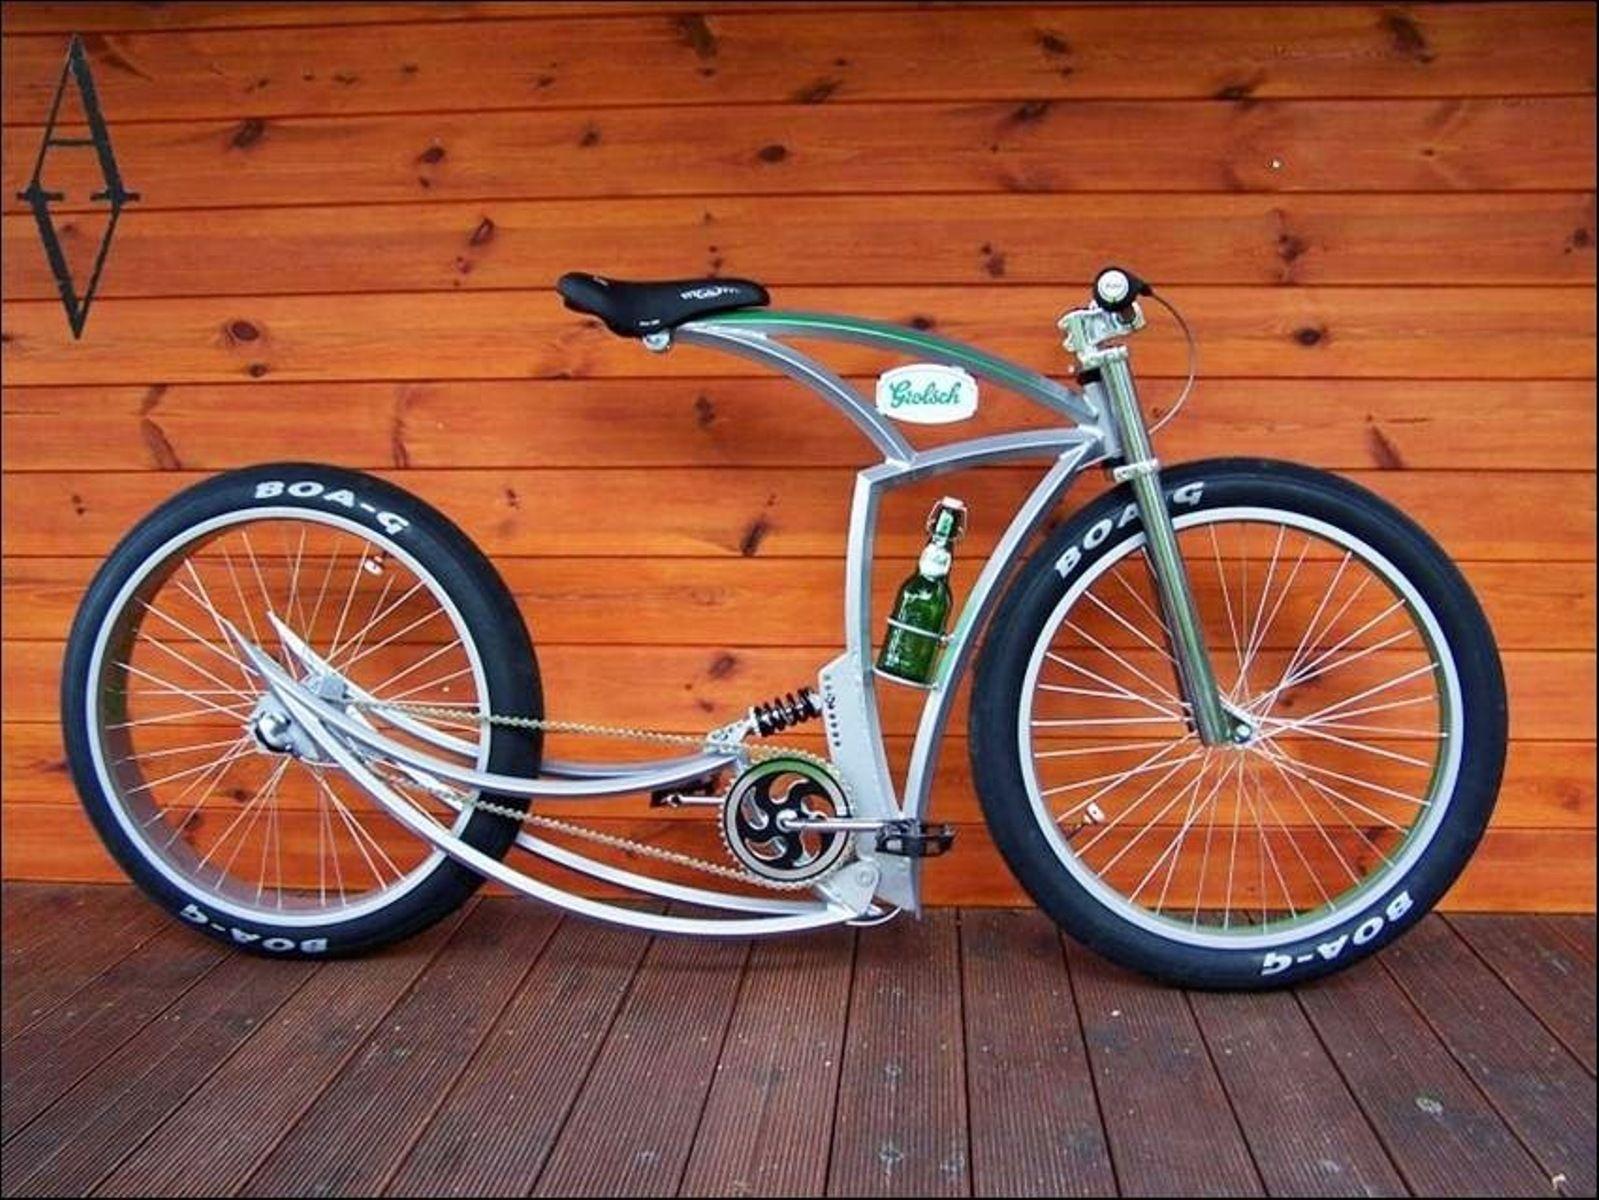 So Pra Pisos Muuuito Bons Chopper Bike Bike Frame Bicycle Design